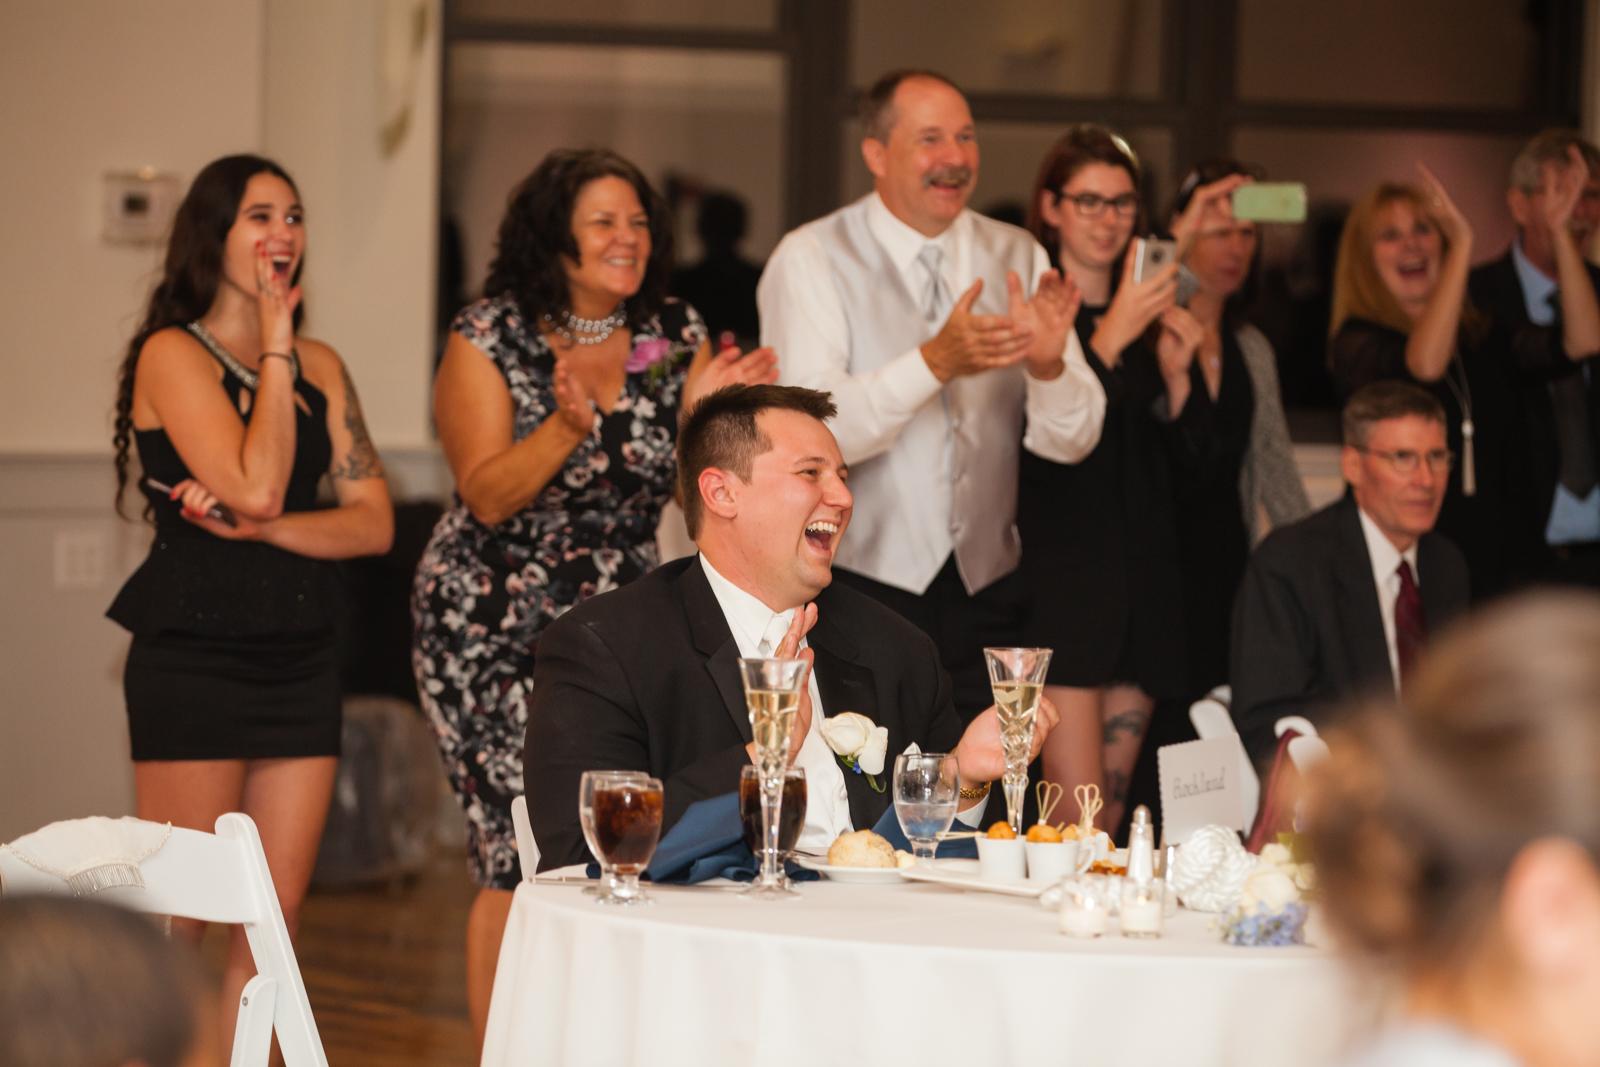 Eastons-Beach-Rotunda-Ballroom-Wedding-Newport-Rhode-Island-PhotographybyAmandaMorgan-112.jpg